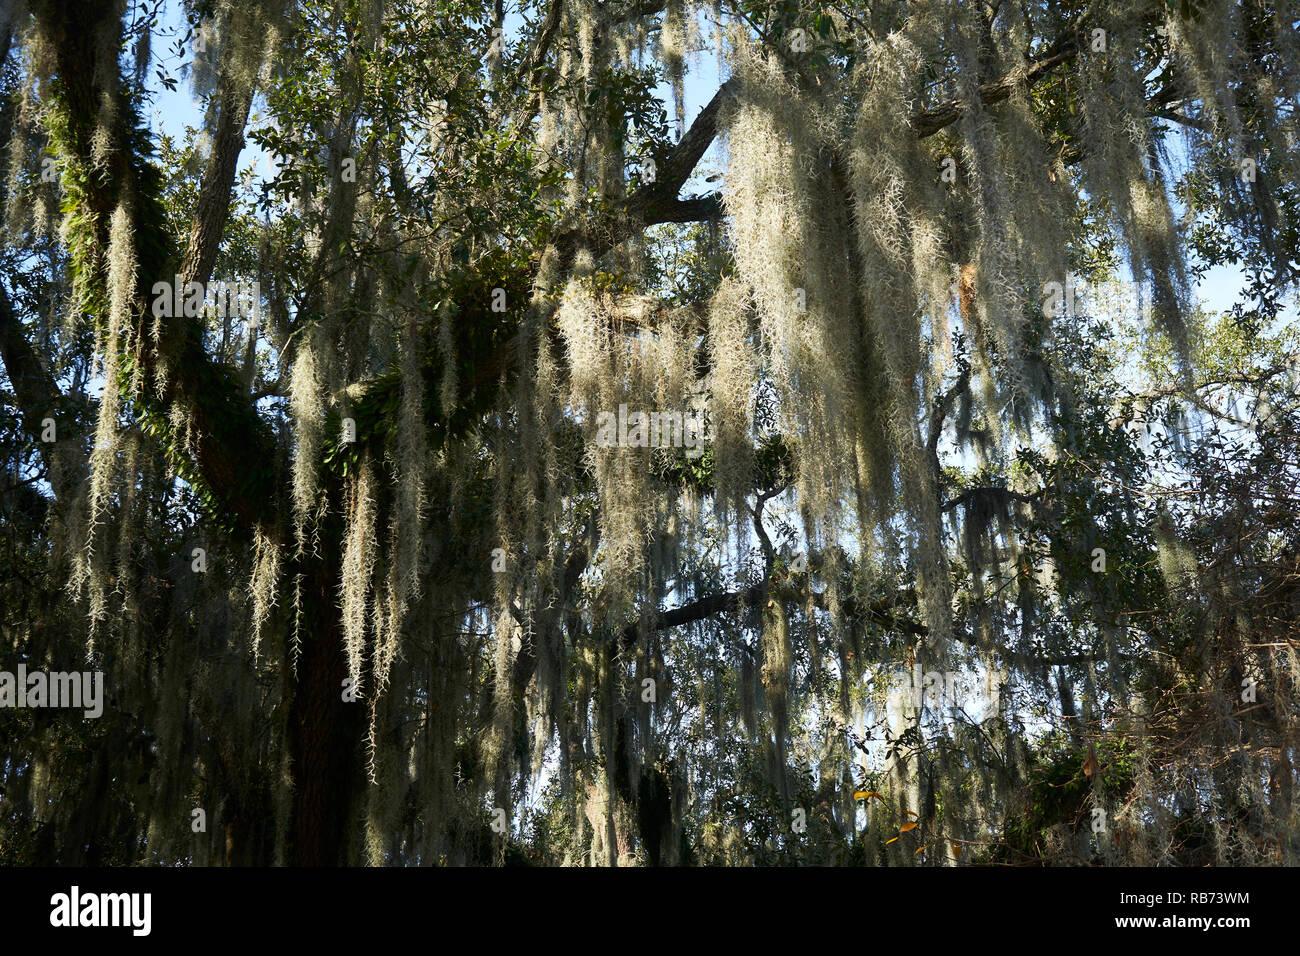 Mossy oak tree in City Park, New Orleans, Louisiana. - Stock Image